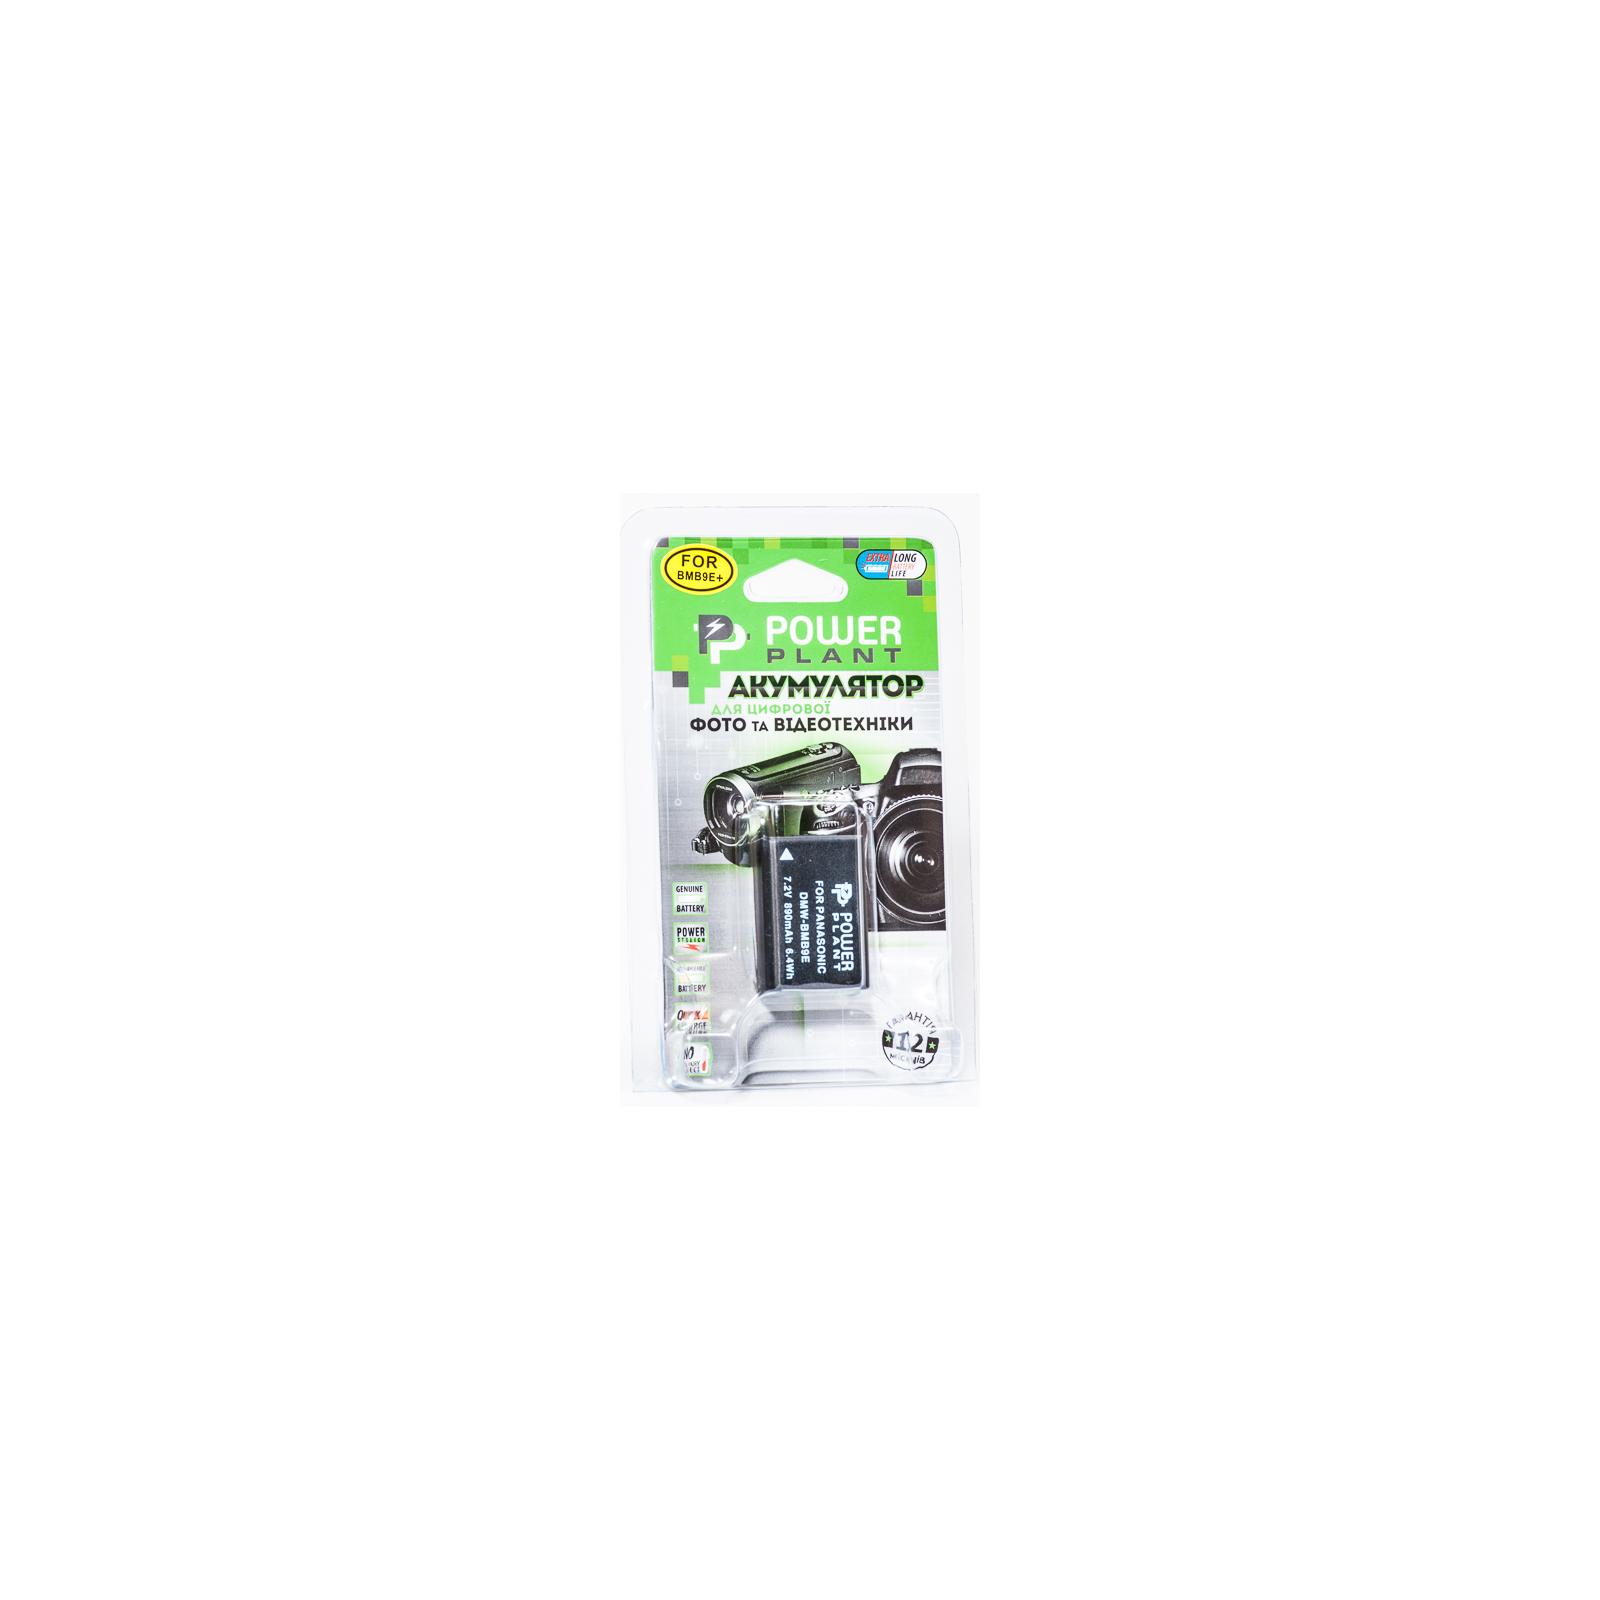 Аккумулятор к фото/видео PowerPlant Panasonic DMW-BMB9E, BP-DC9 (DV00DV1294) изображение 3